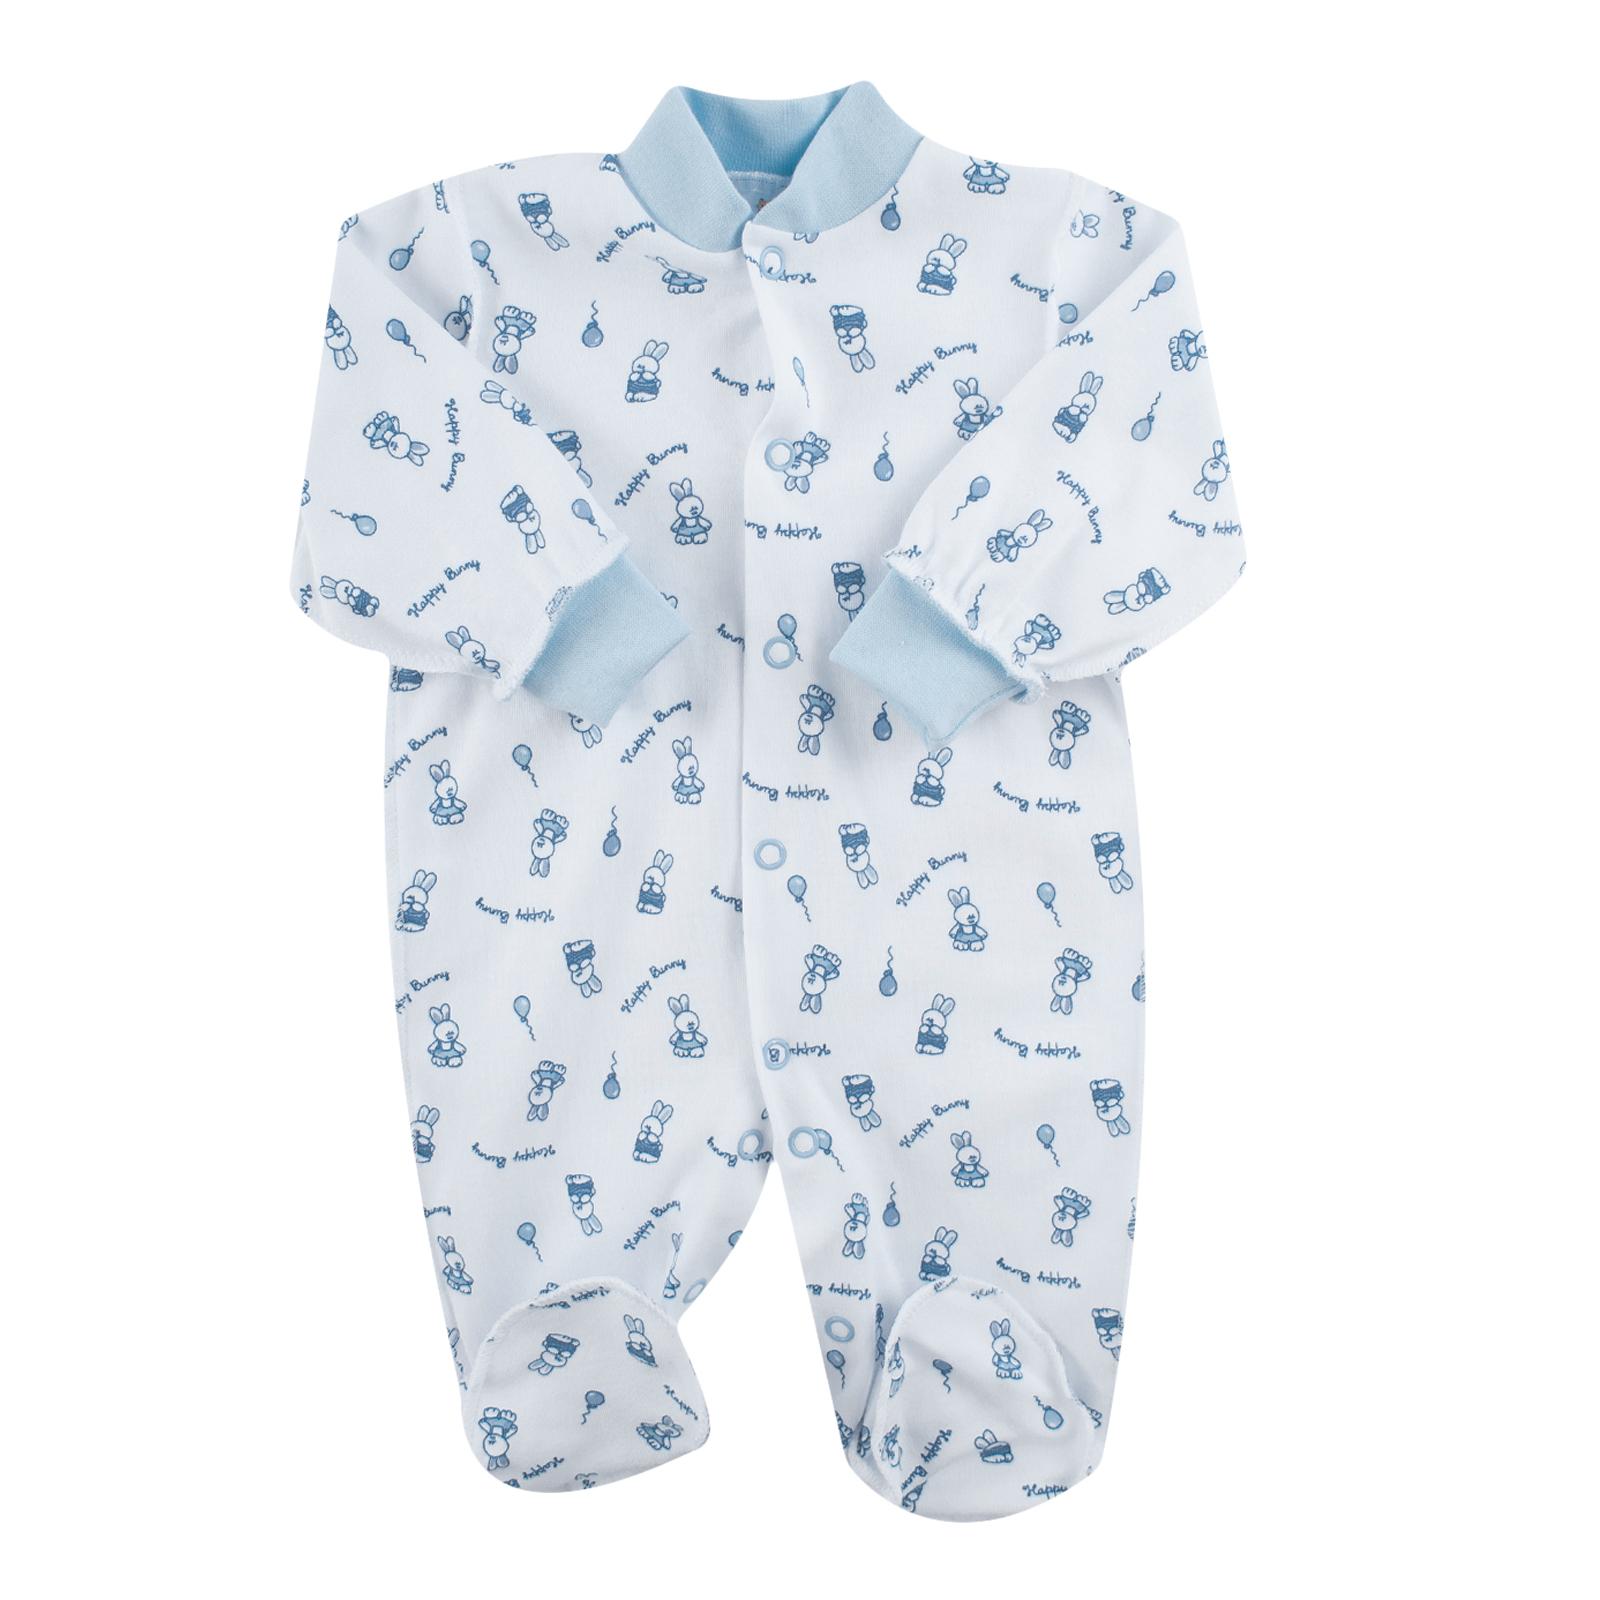 Комбинезон КОТМАРКОТ для мальчика, цвет набивка голубой тон 1-3 мес (размер 62)<br>